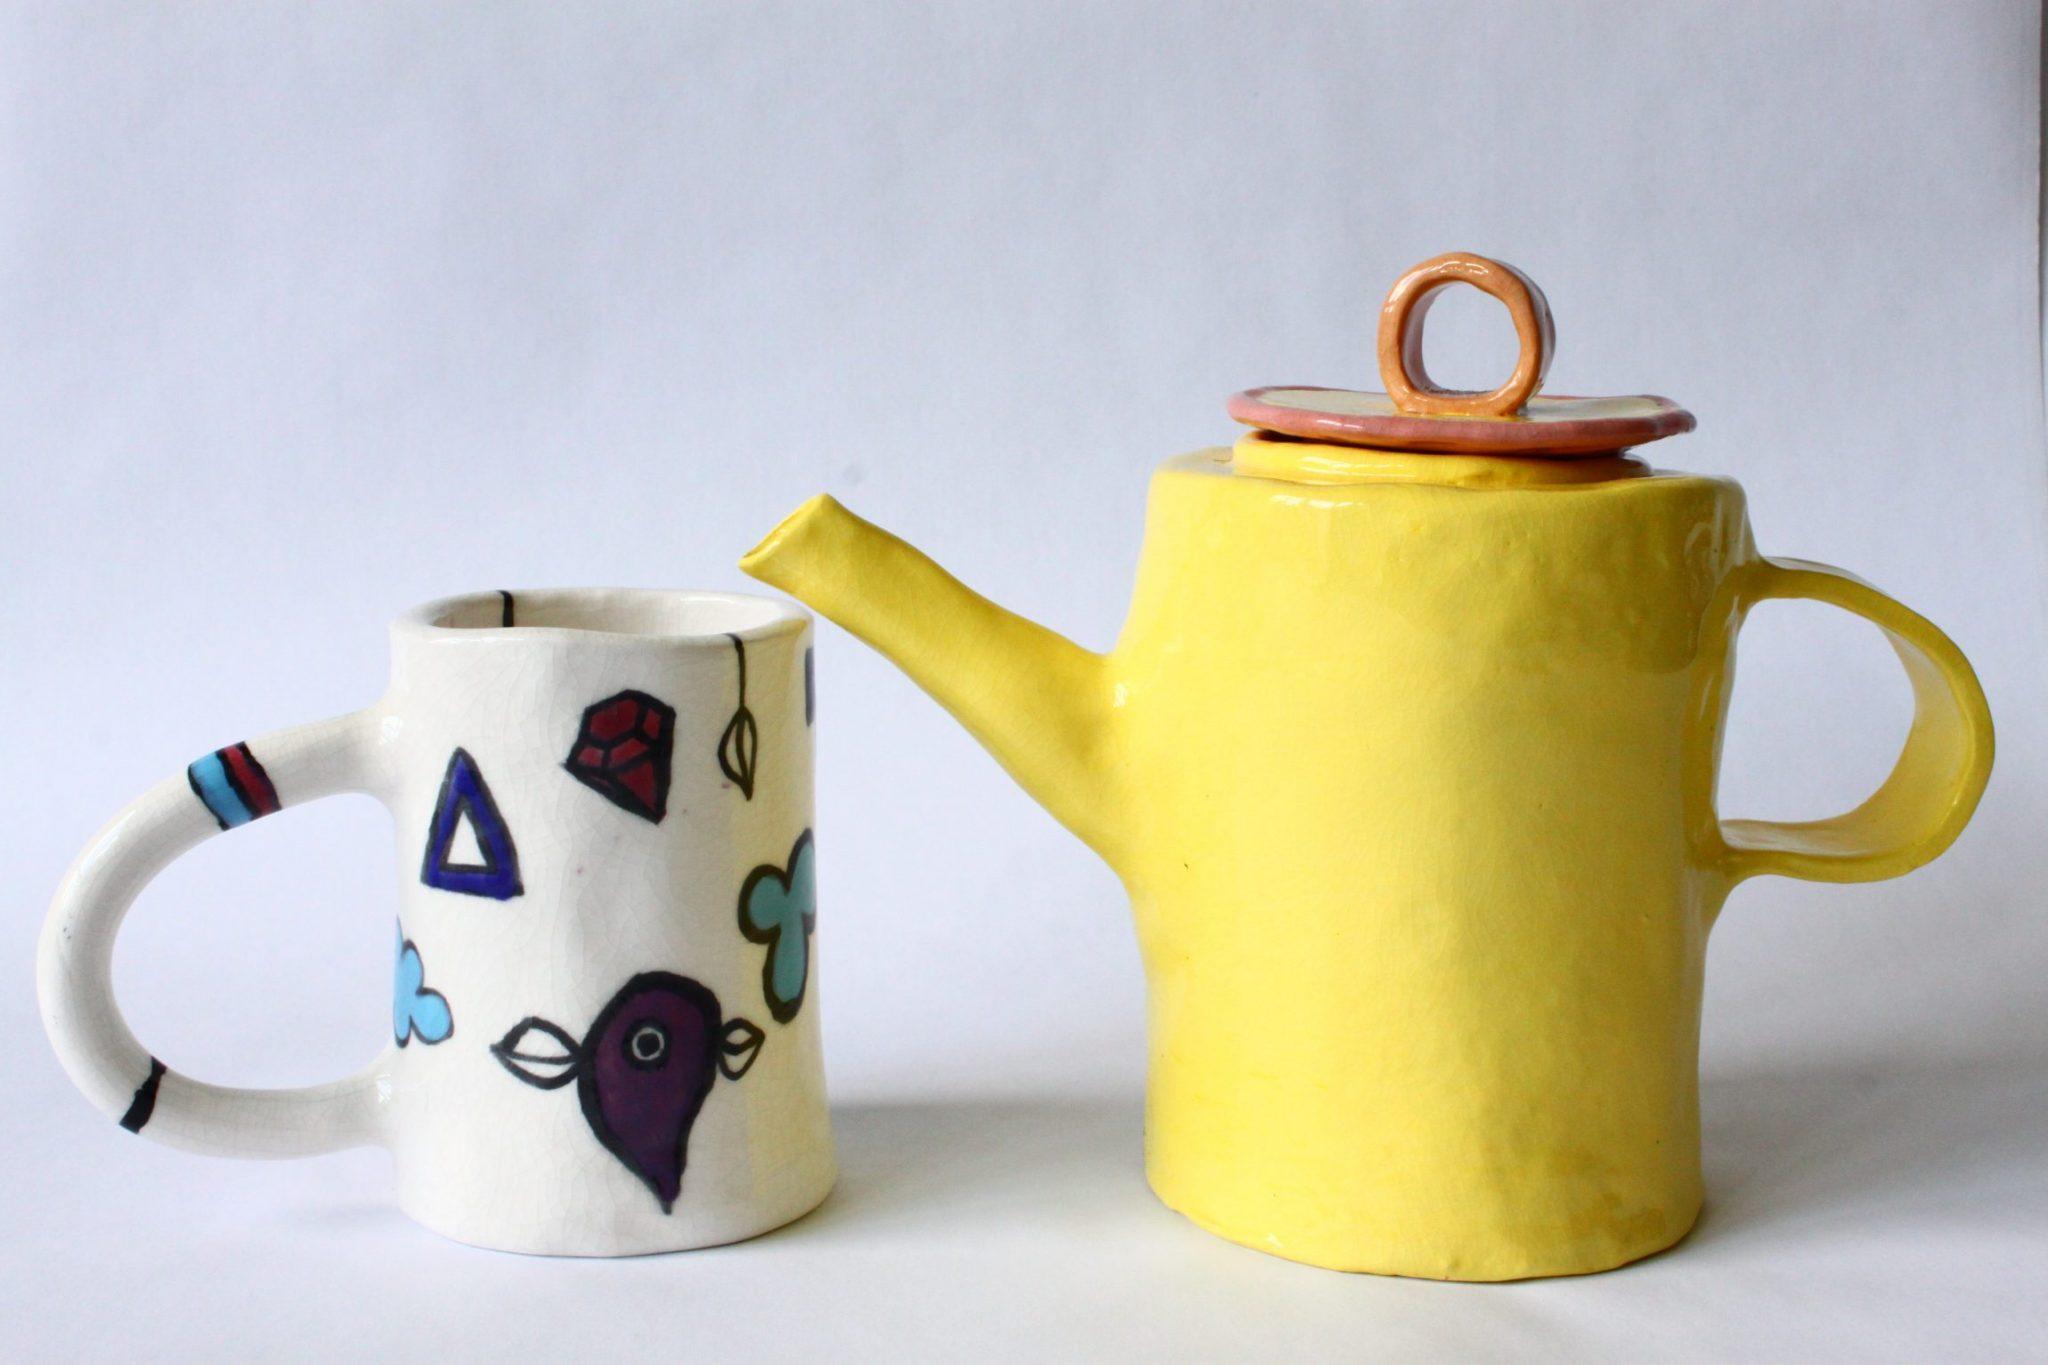 sculpture-tea-set